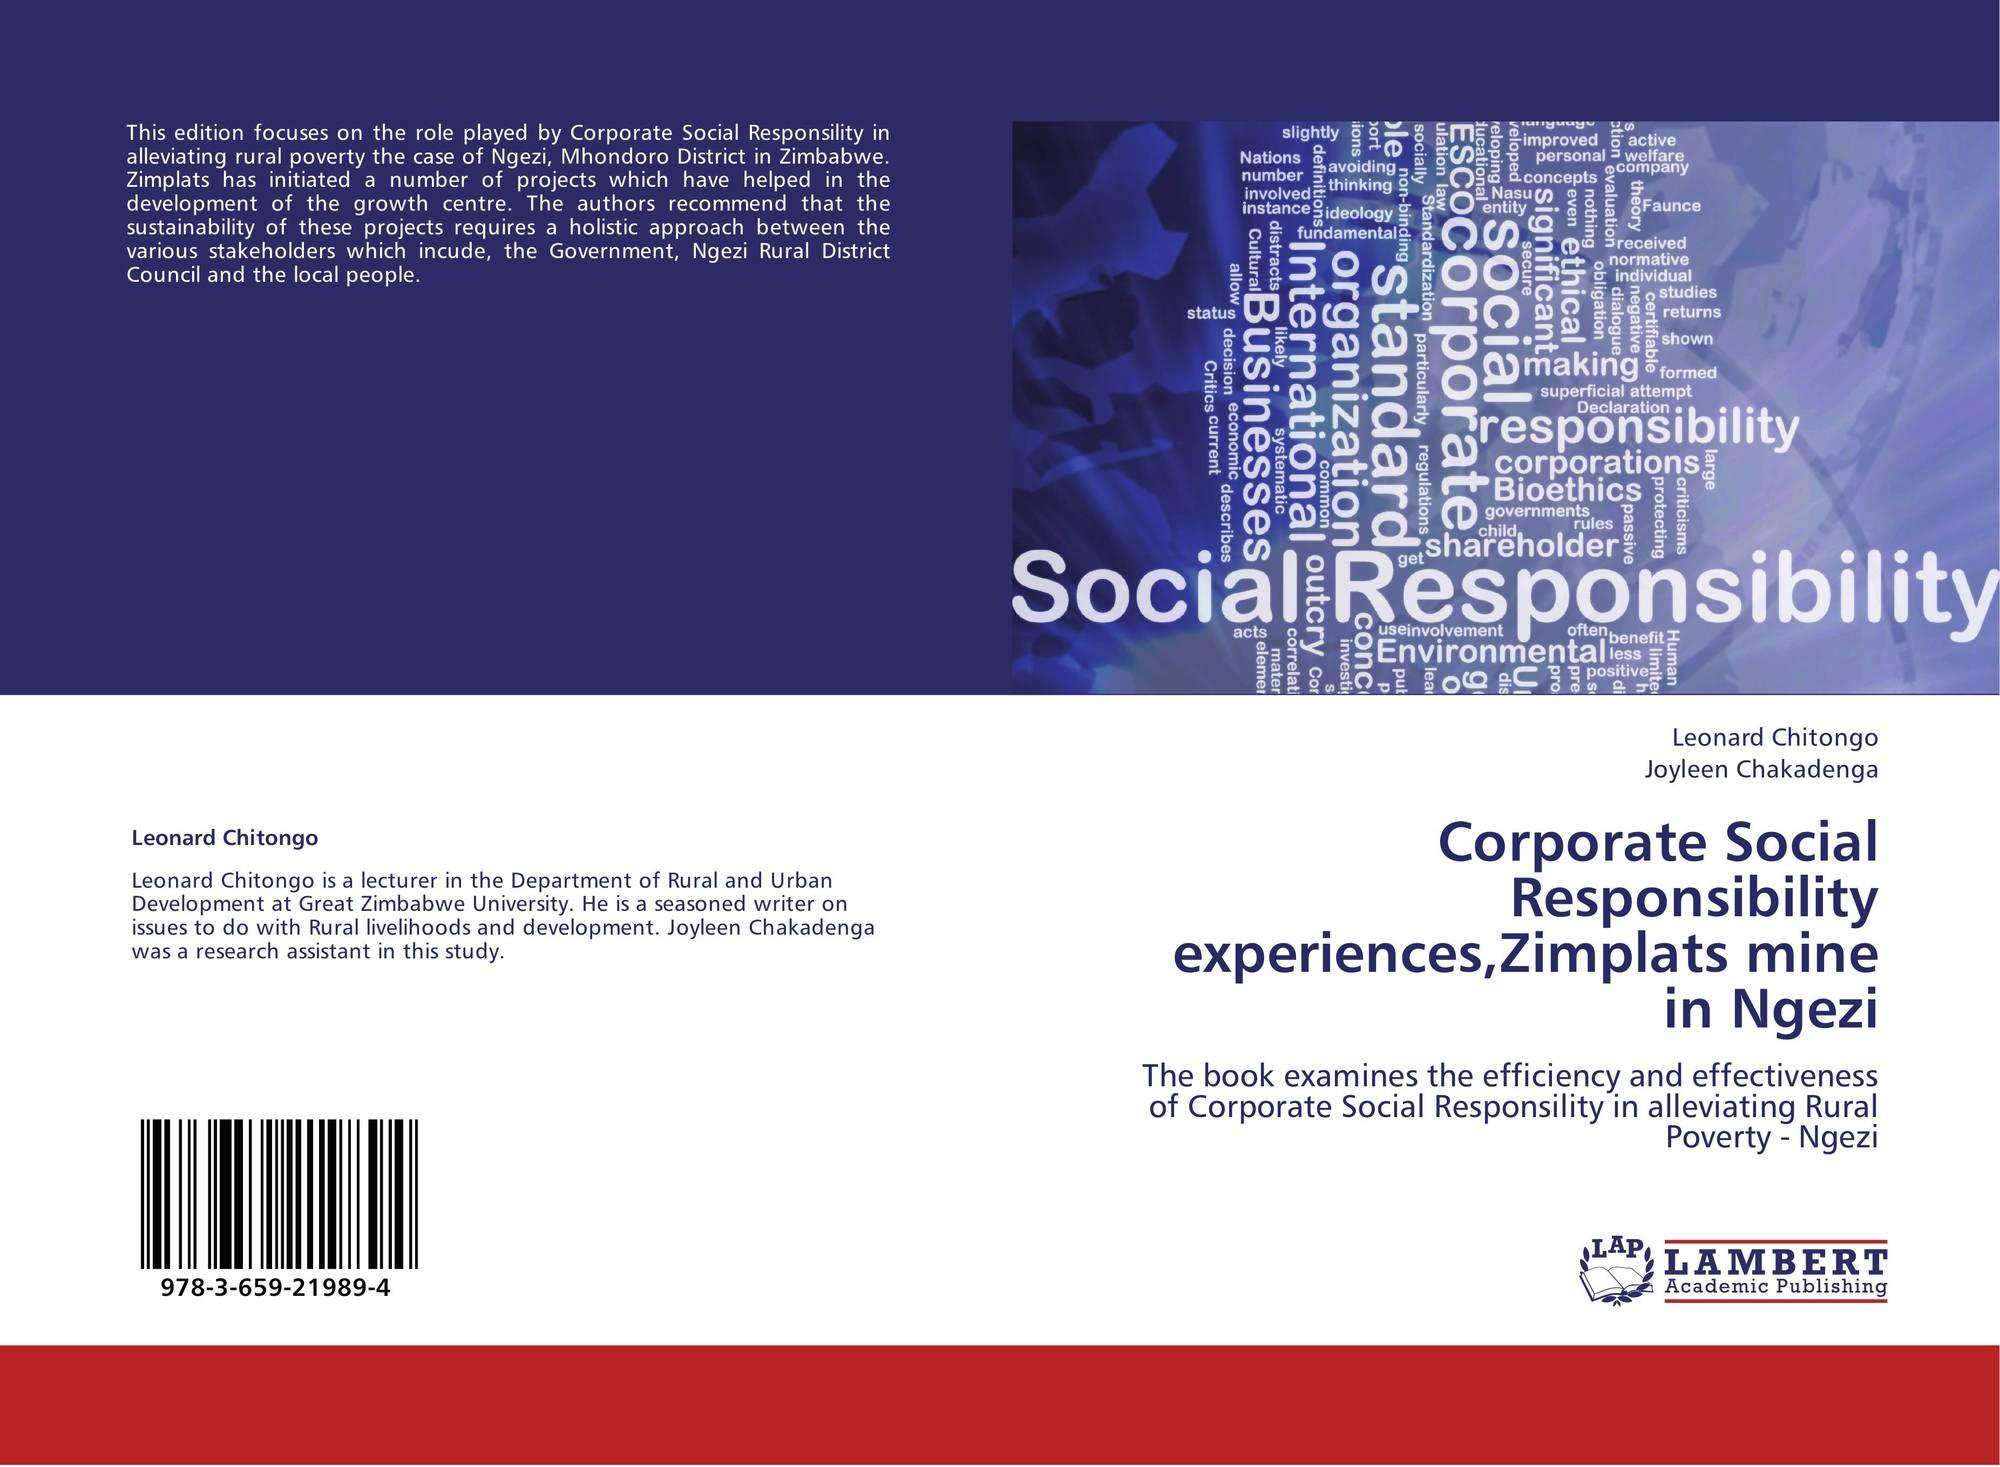 corporate social responsibility 14 essay